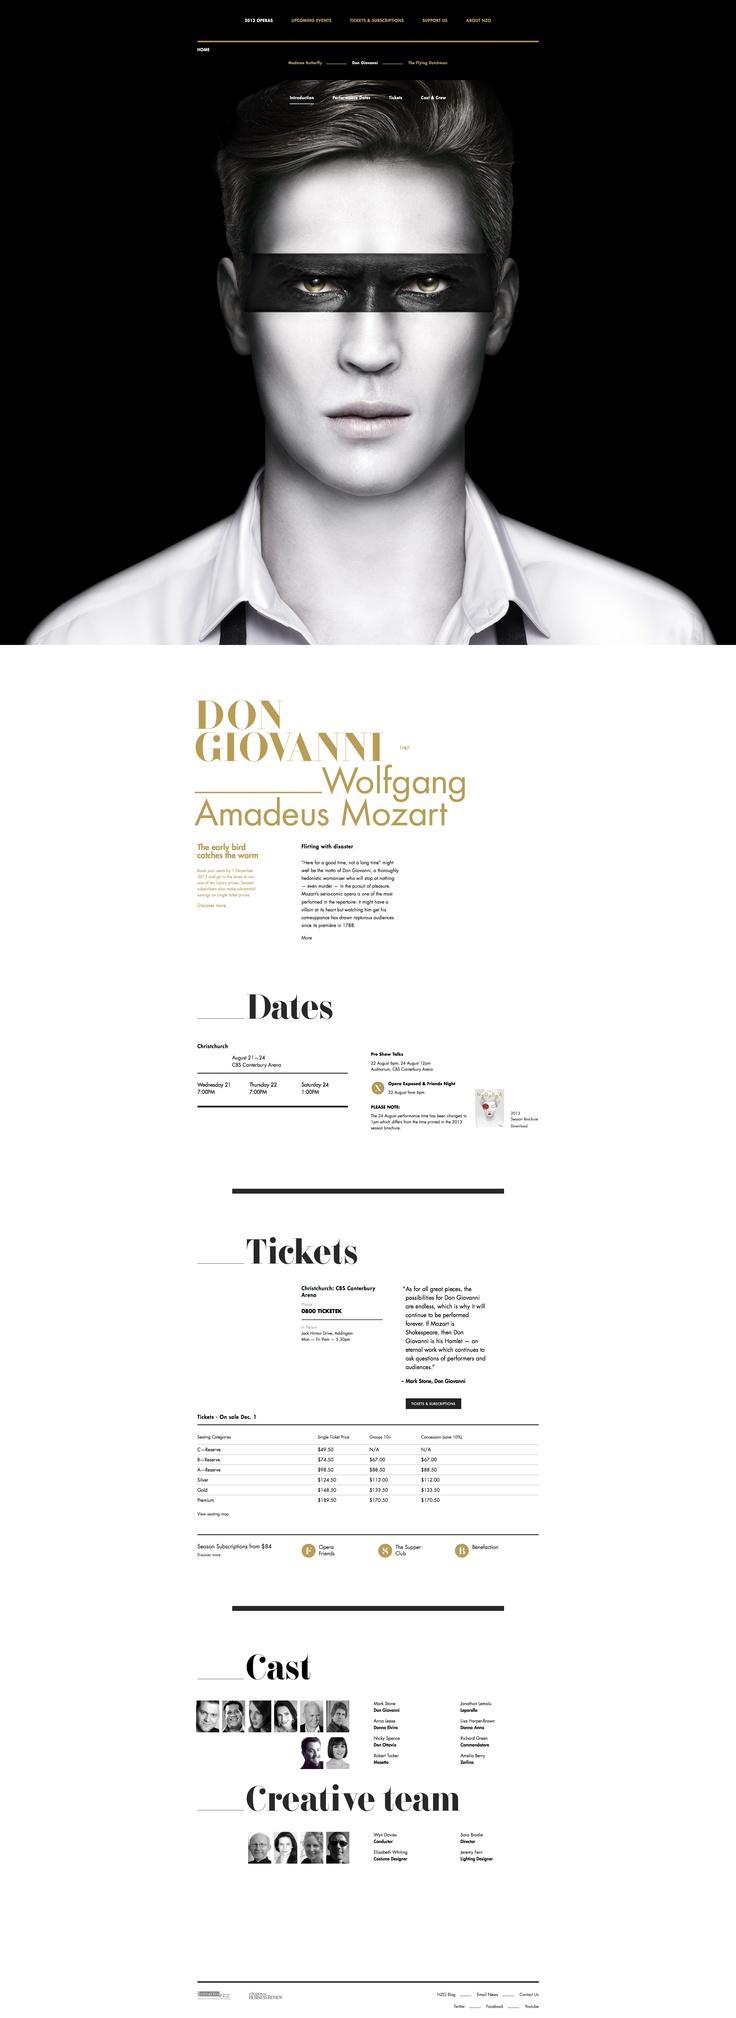 NZ Opera — http://nzopera.com/